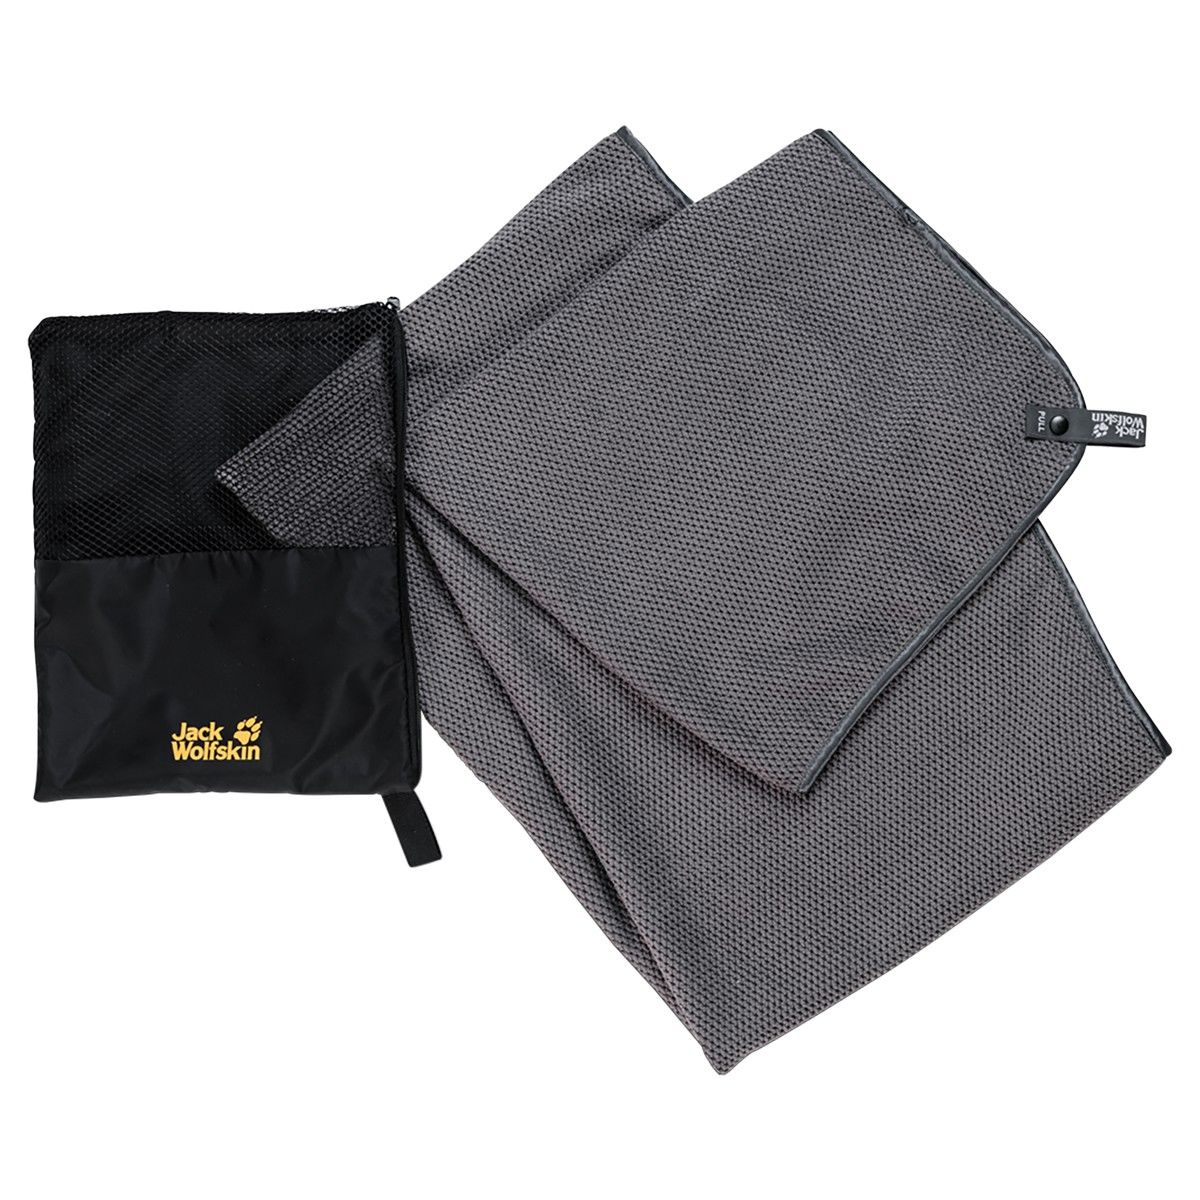 Jack Wolfskin Waffel Towel Grau, One Size -Farbe Pebble Grey, One Size